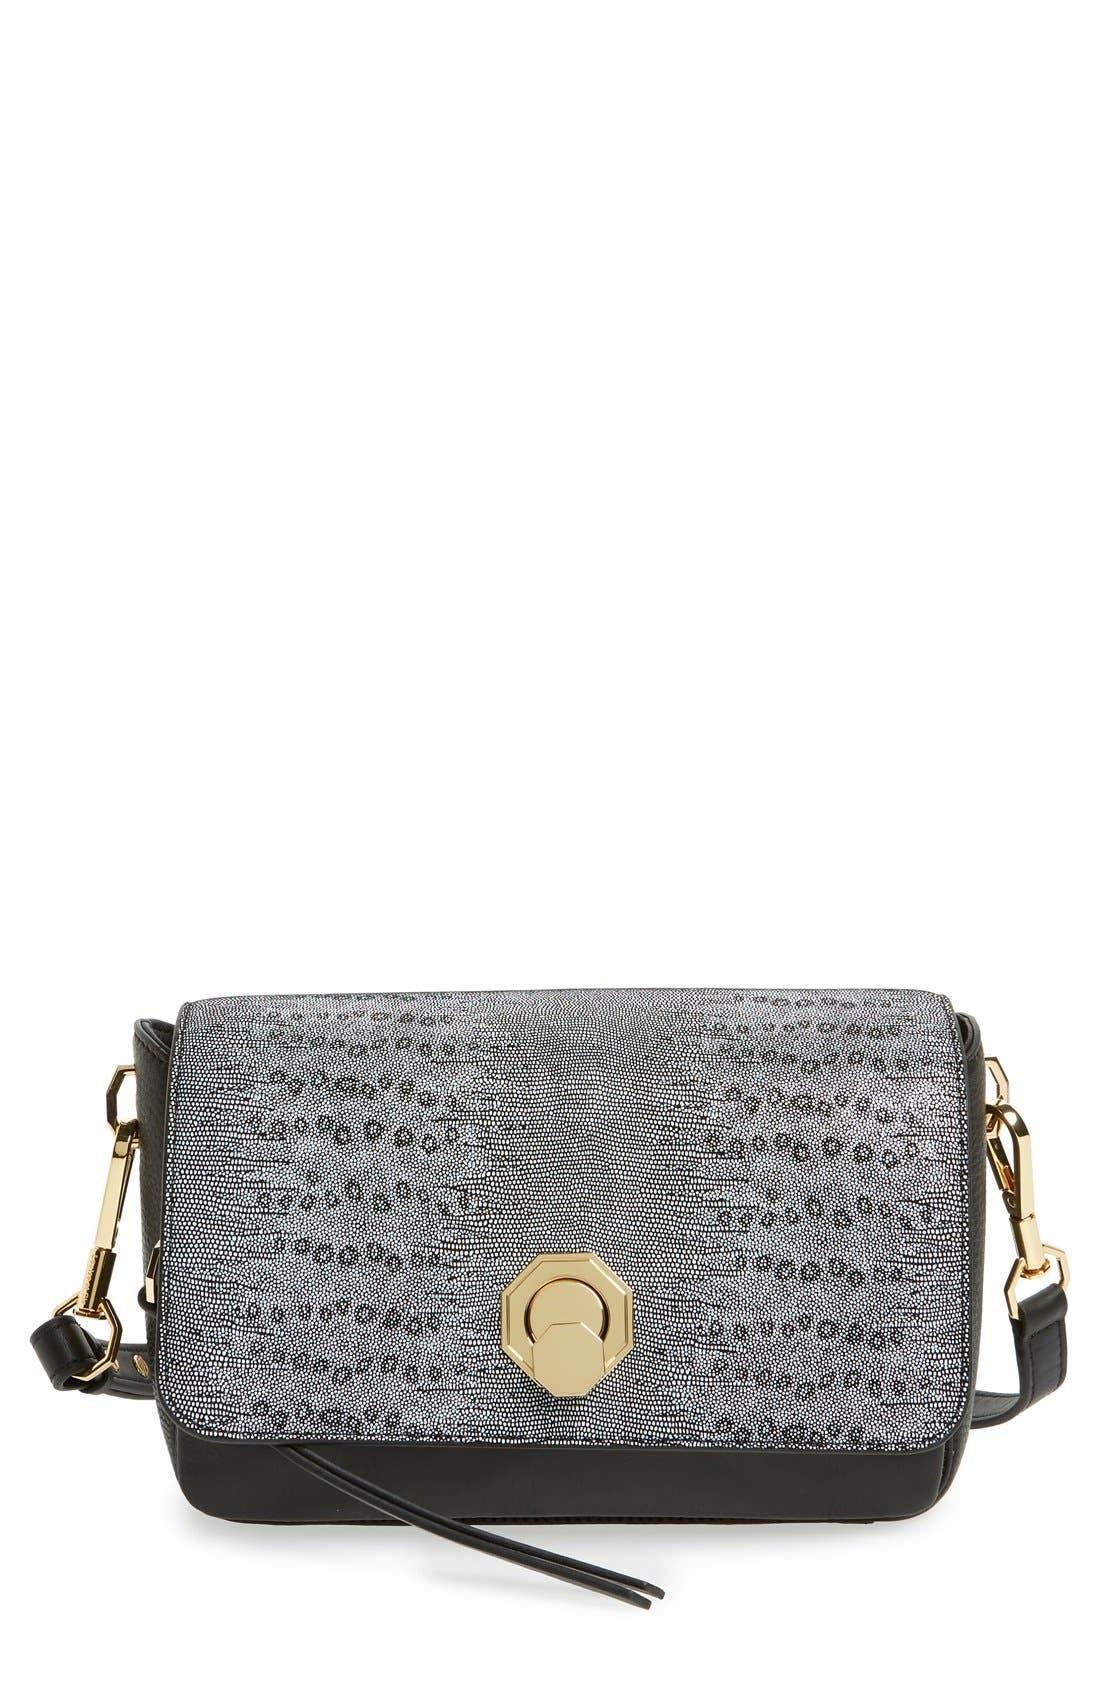 'Small Alis' Leather Crossbody Bag,                         Main,                         color, 001